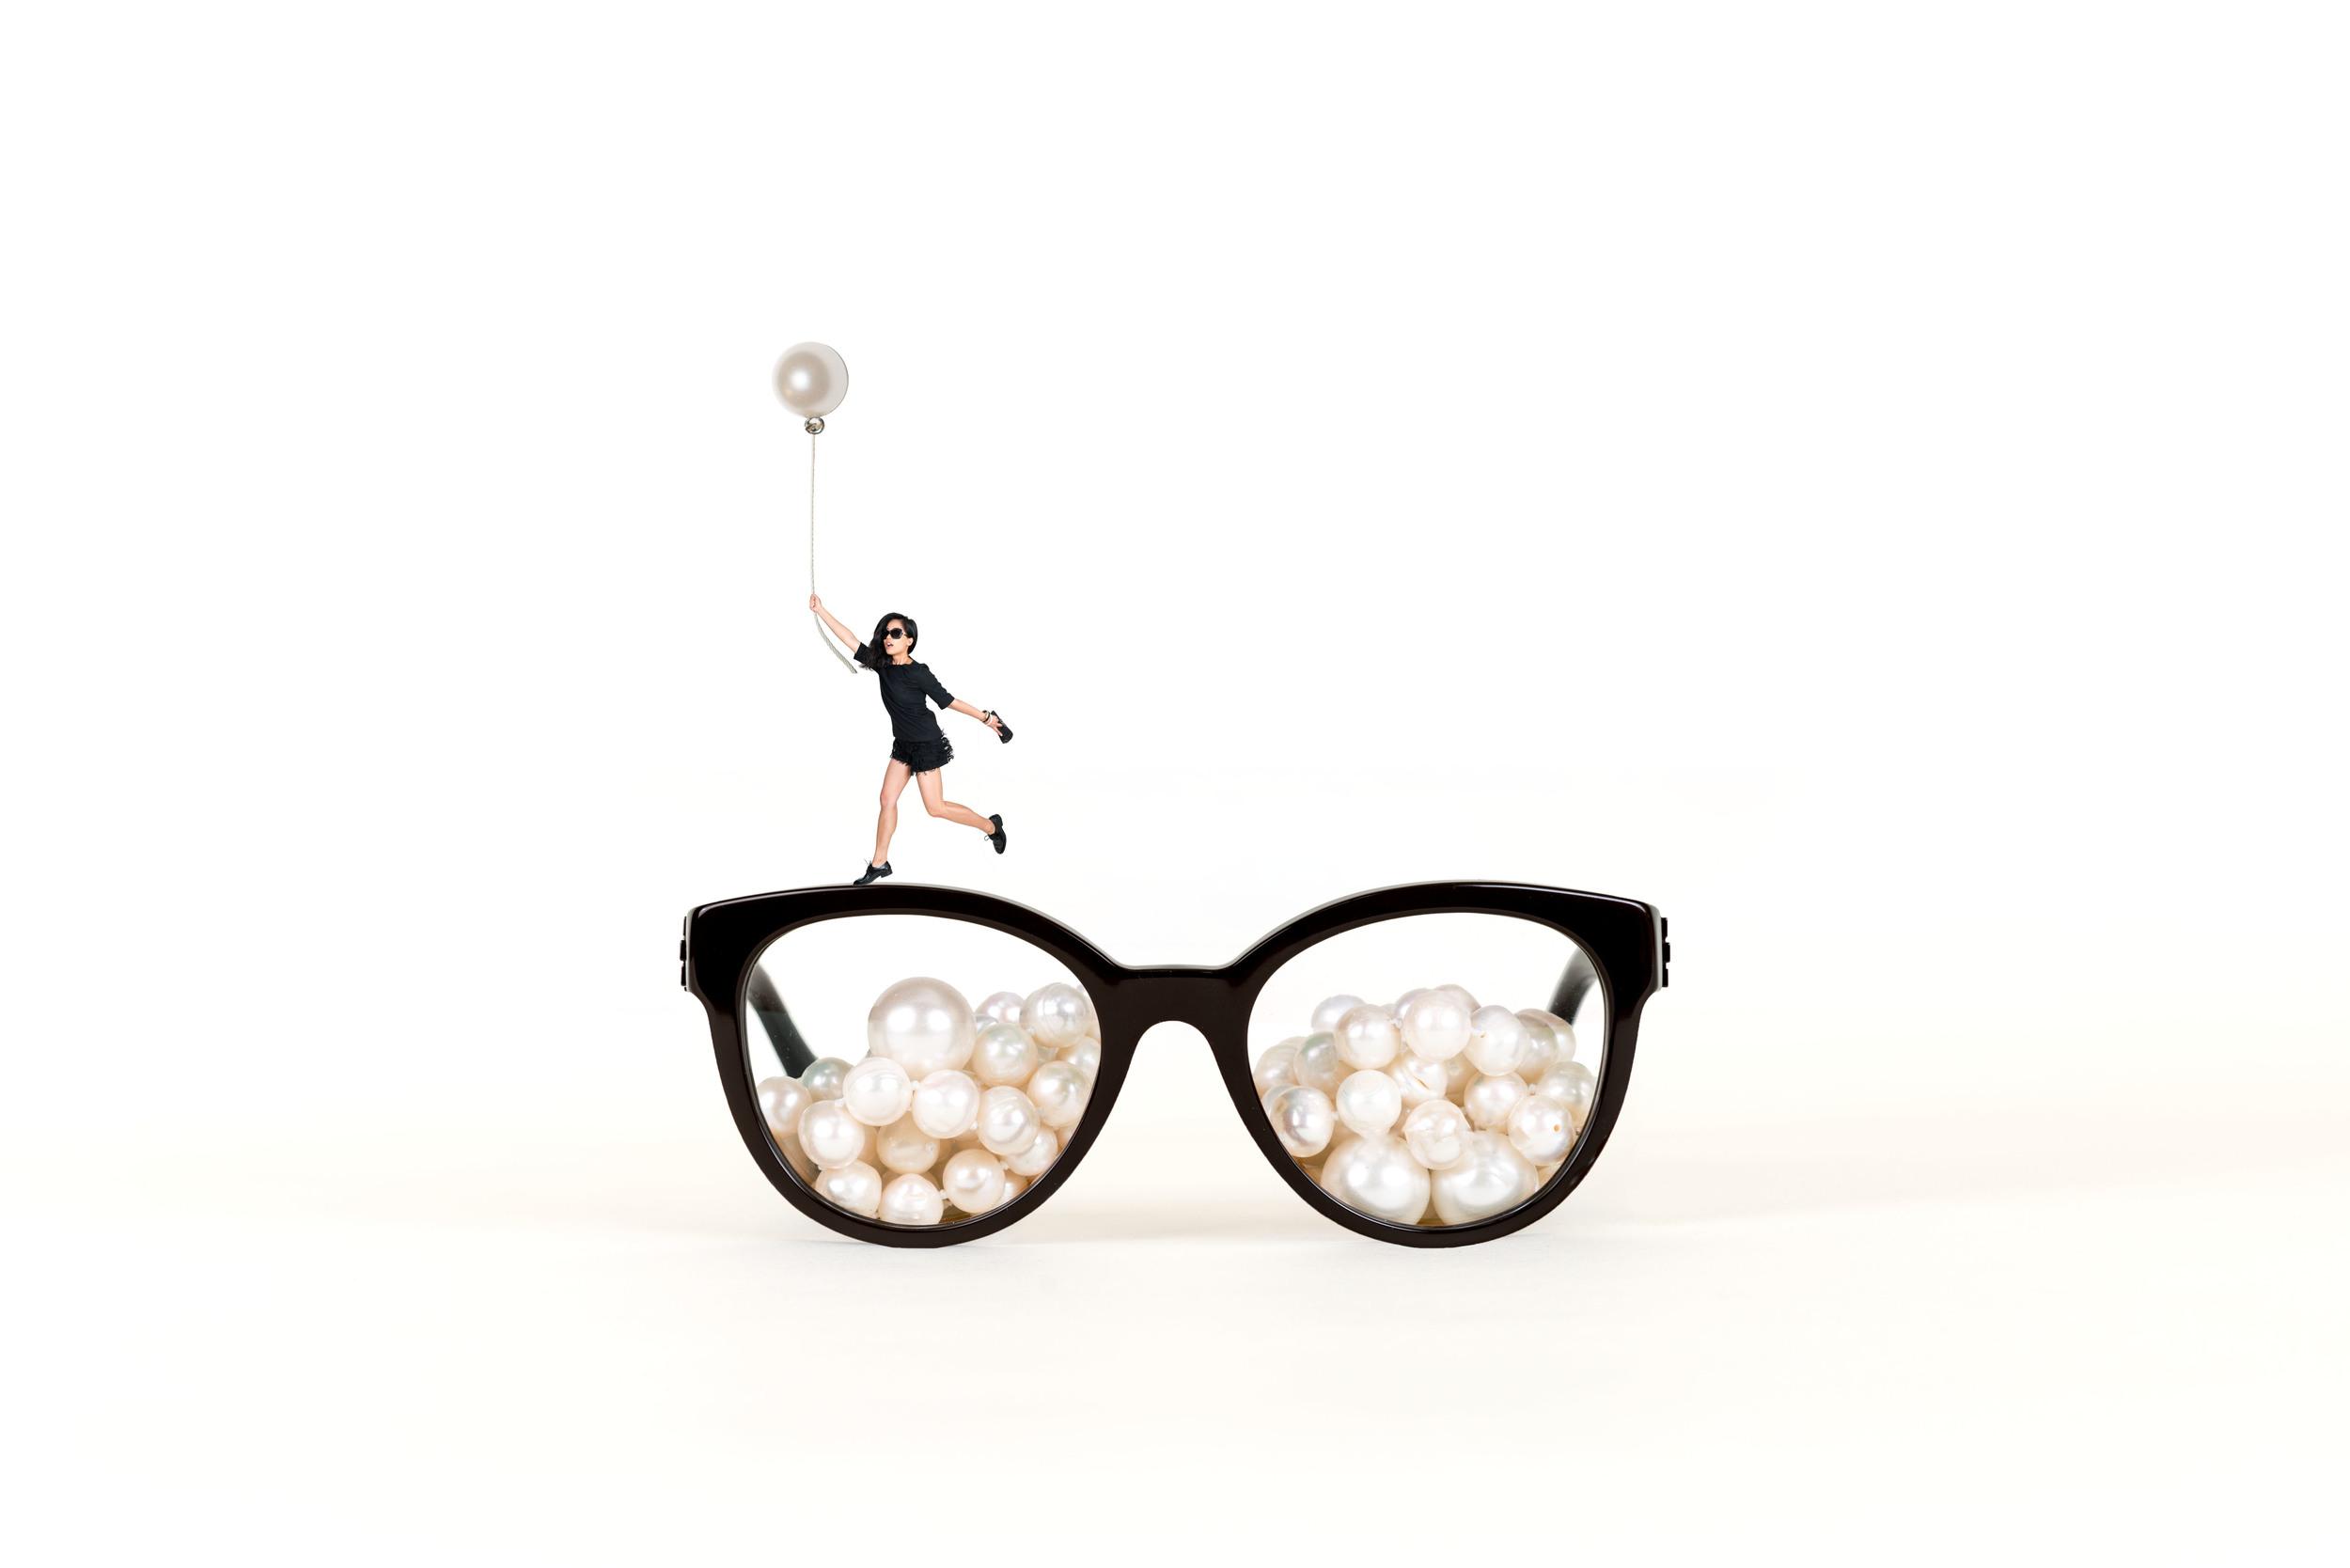 Chanel Concept Pearl's